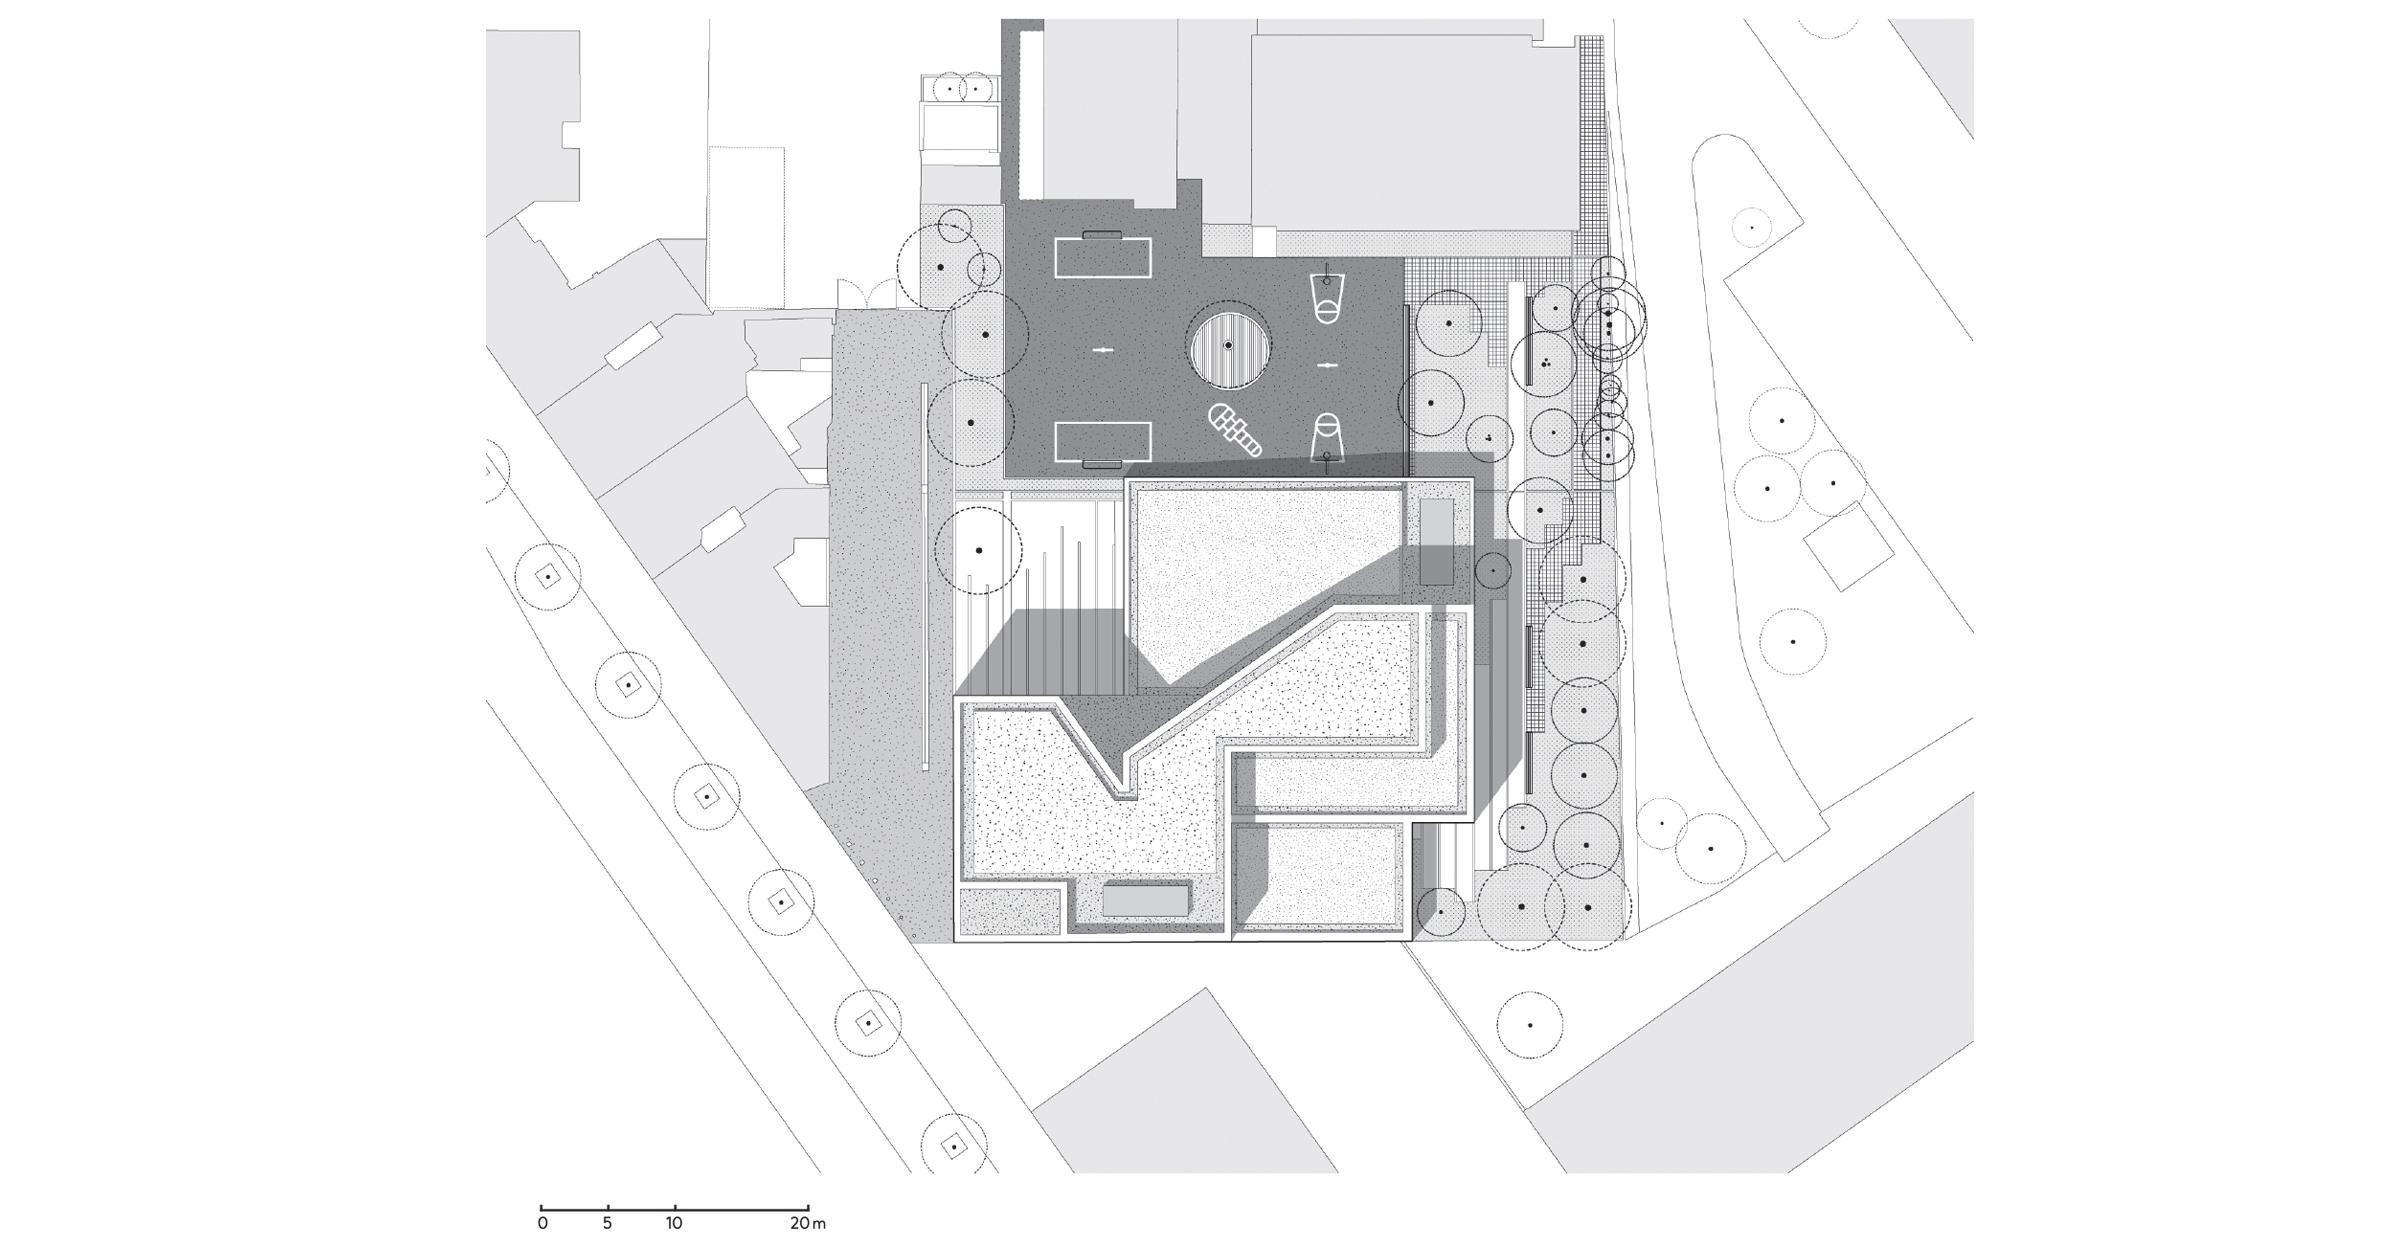 Conservatoire + Cour Oasis ; FORR - PAYSAGE | URBANISME ; FORR paysagiste